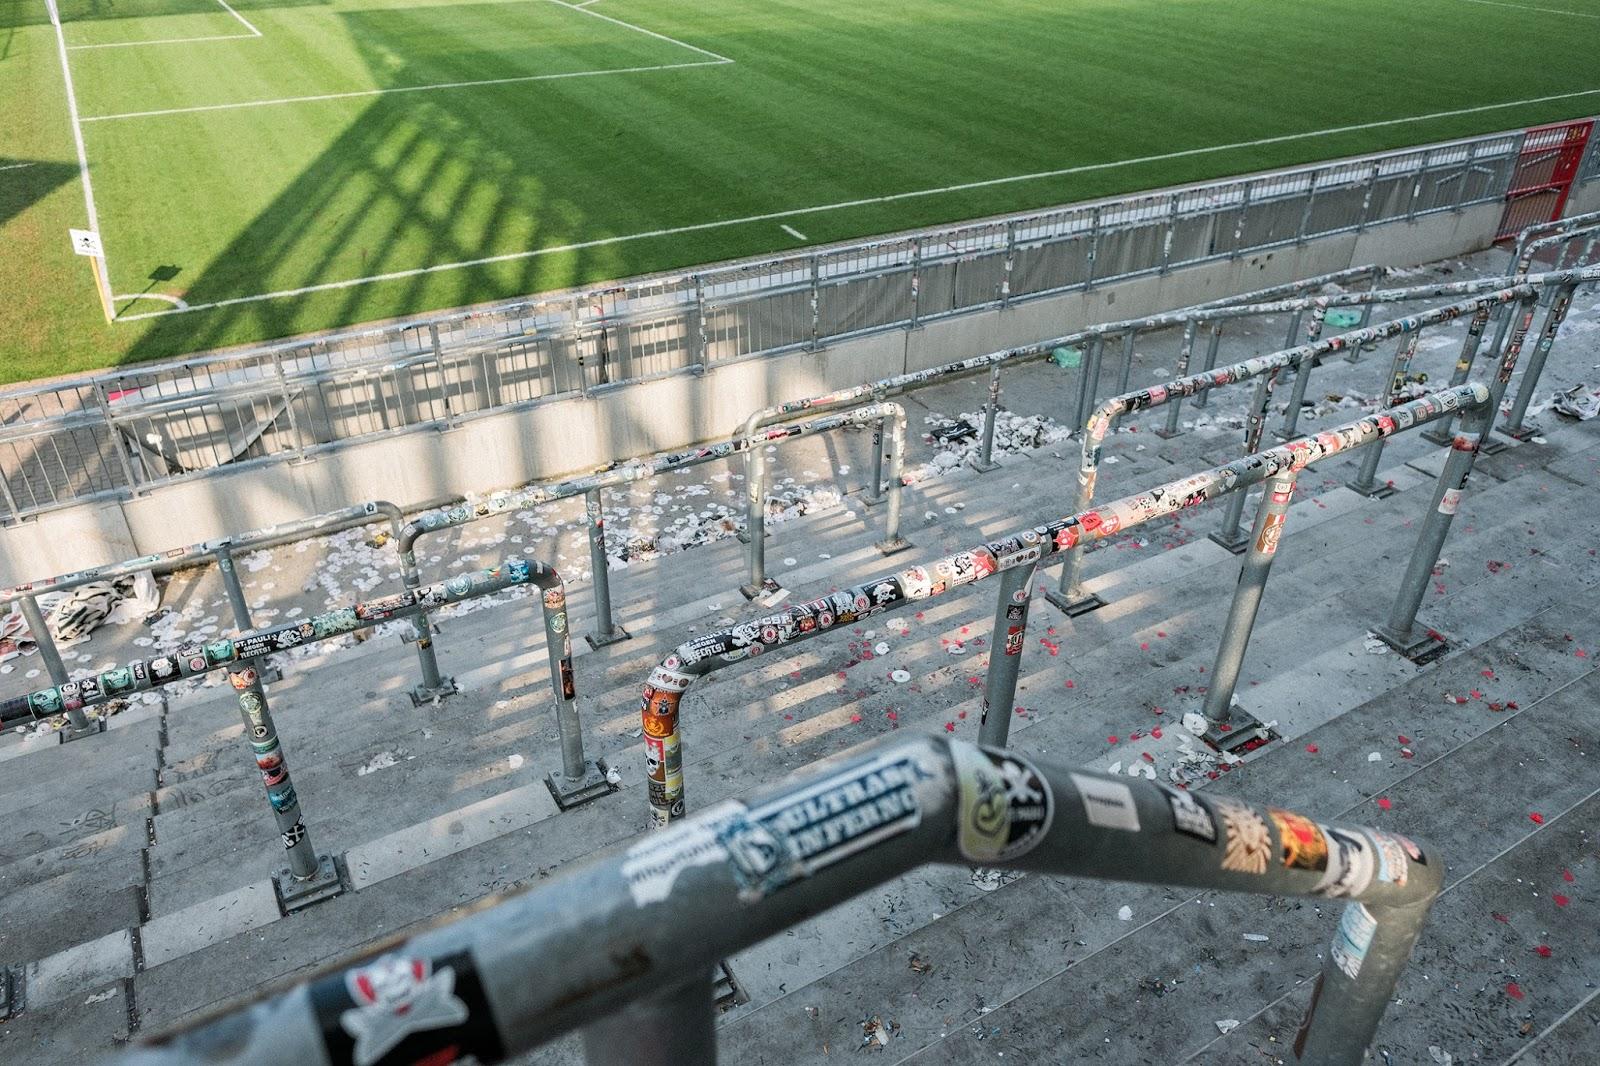 st pauli stadium